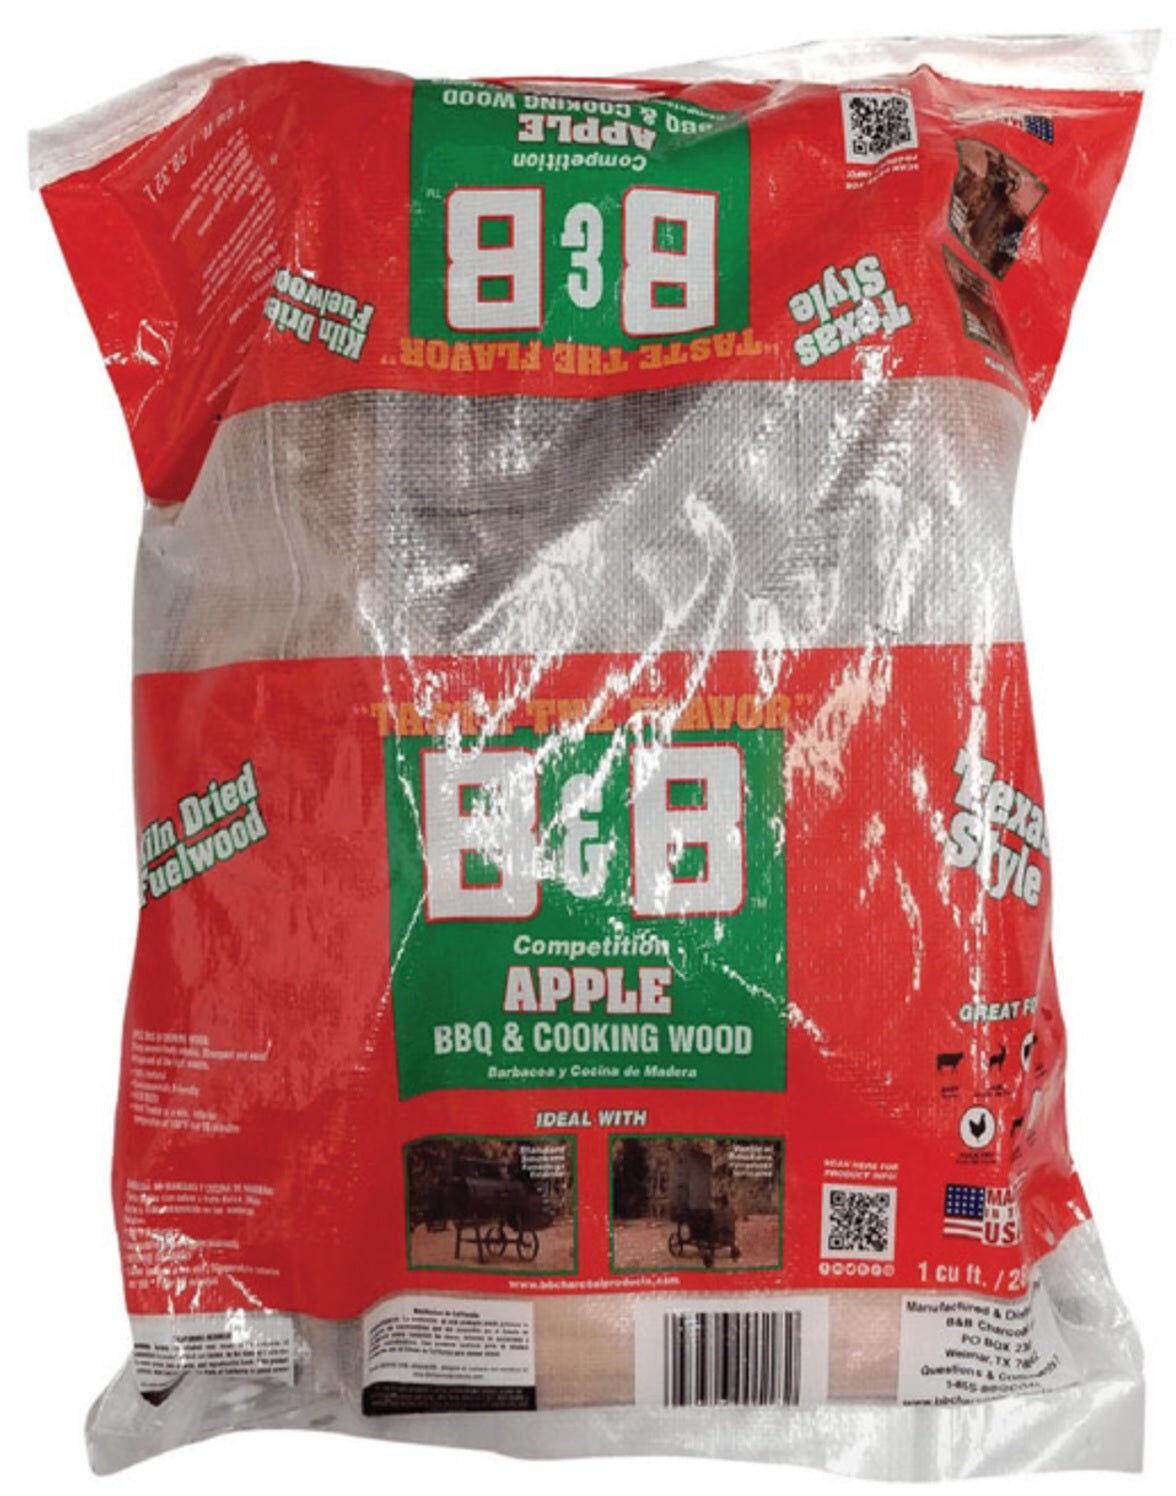 B & B Charcoal 00118 Apple Grill Wood Cooking Logs, 1 Cubic Feet